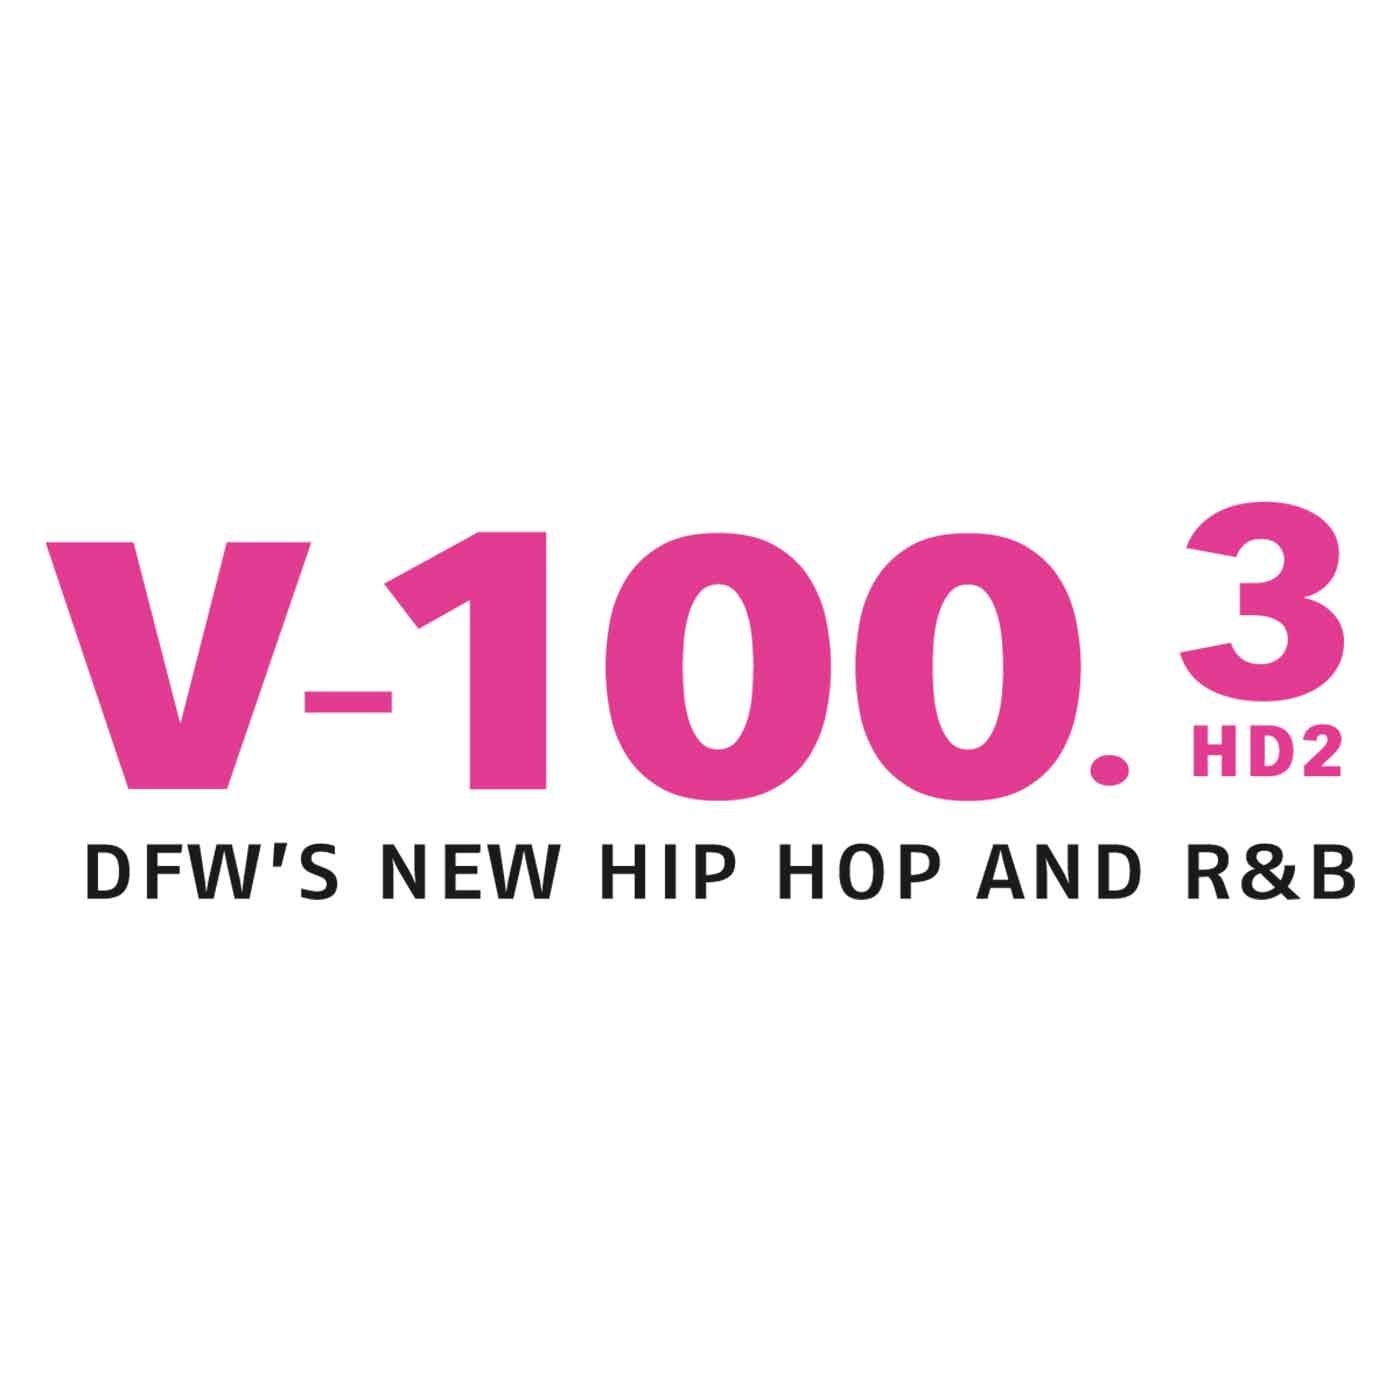 V100.3